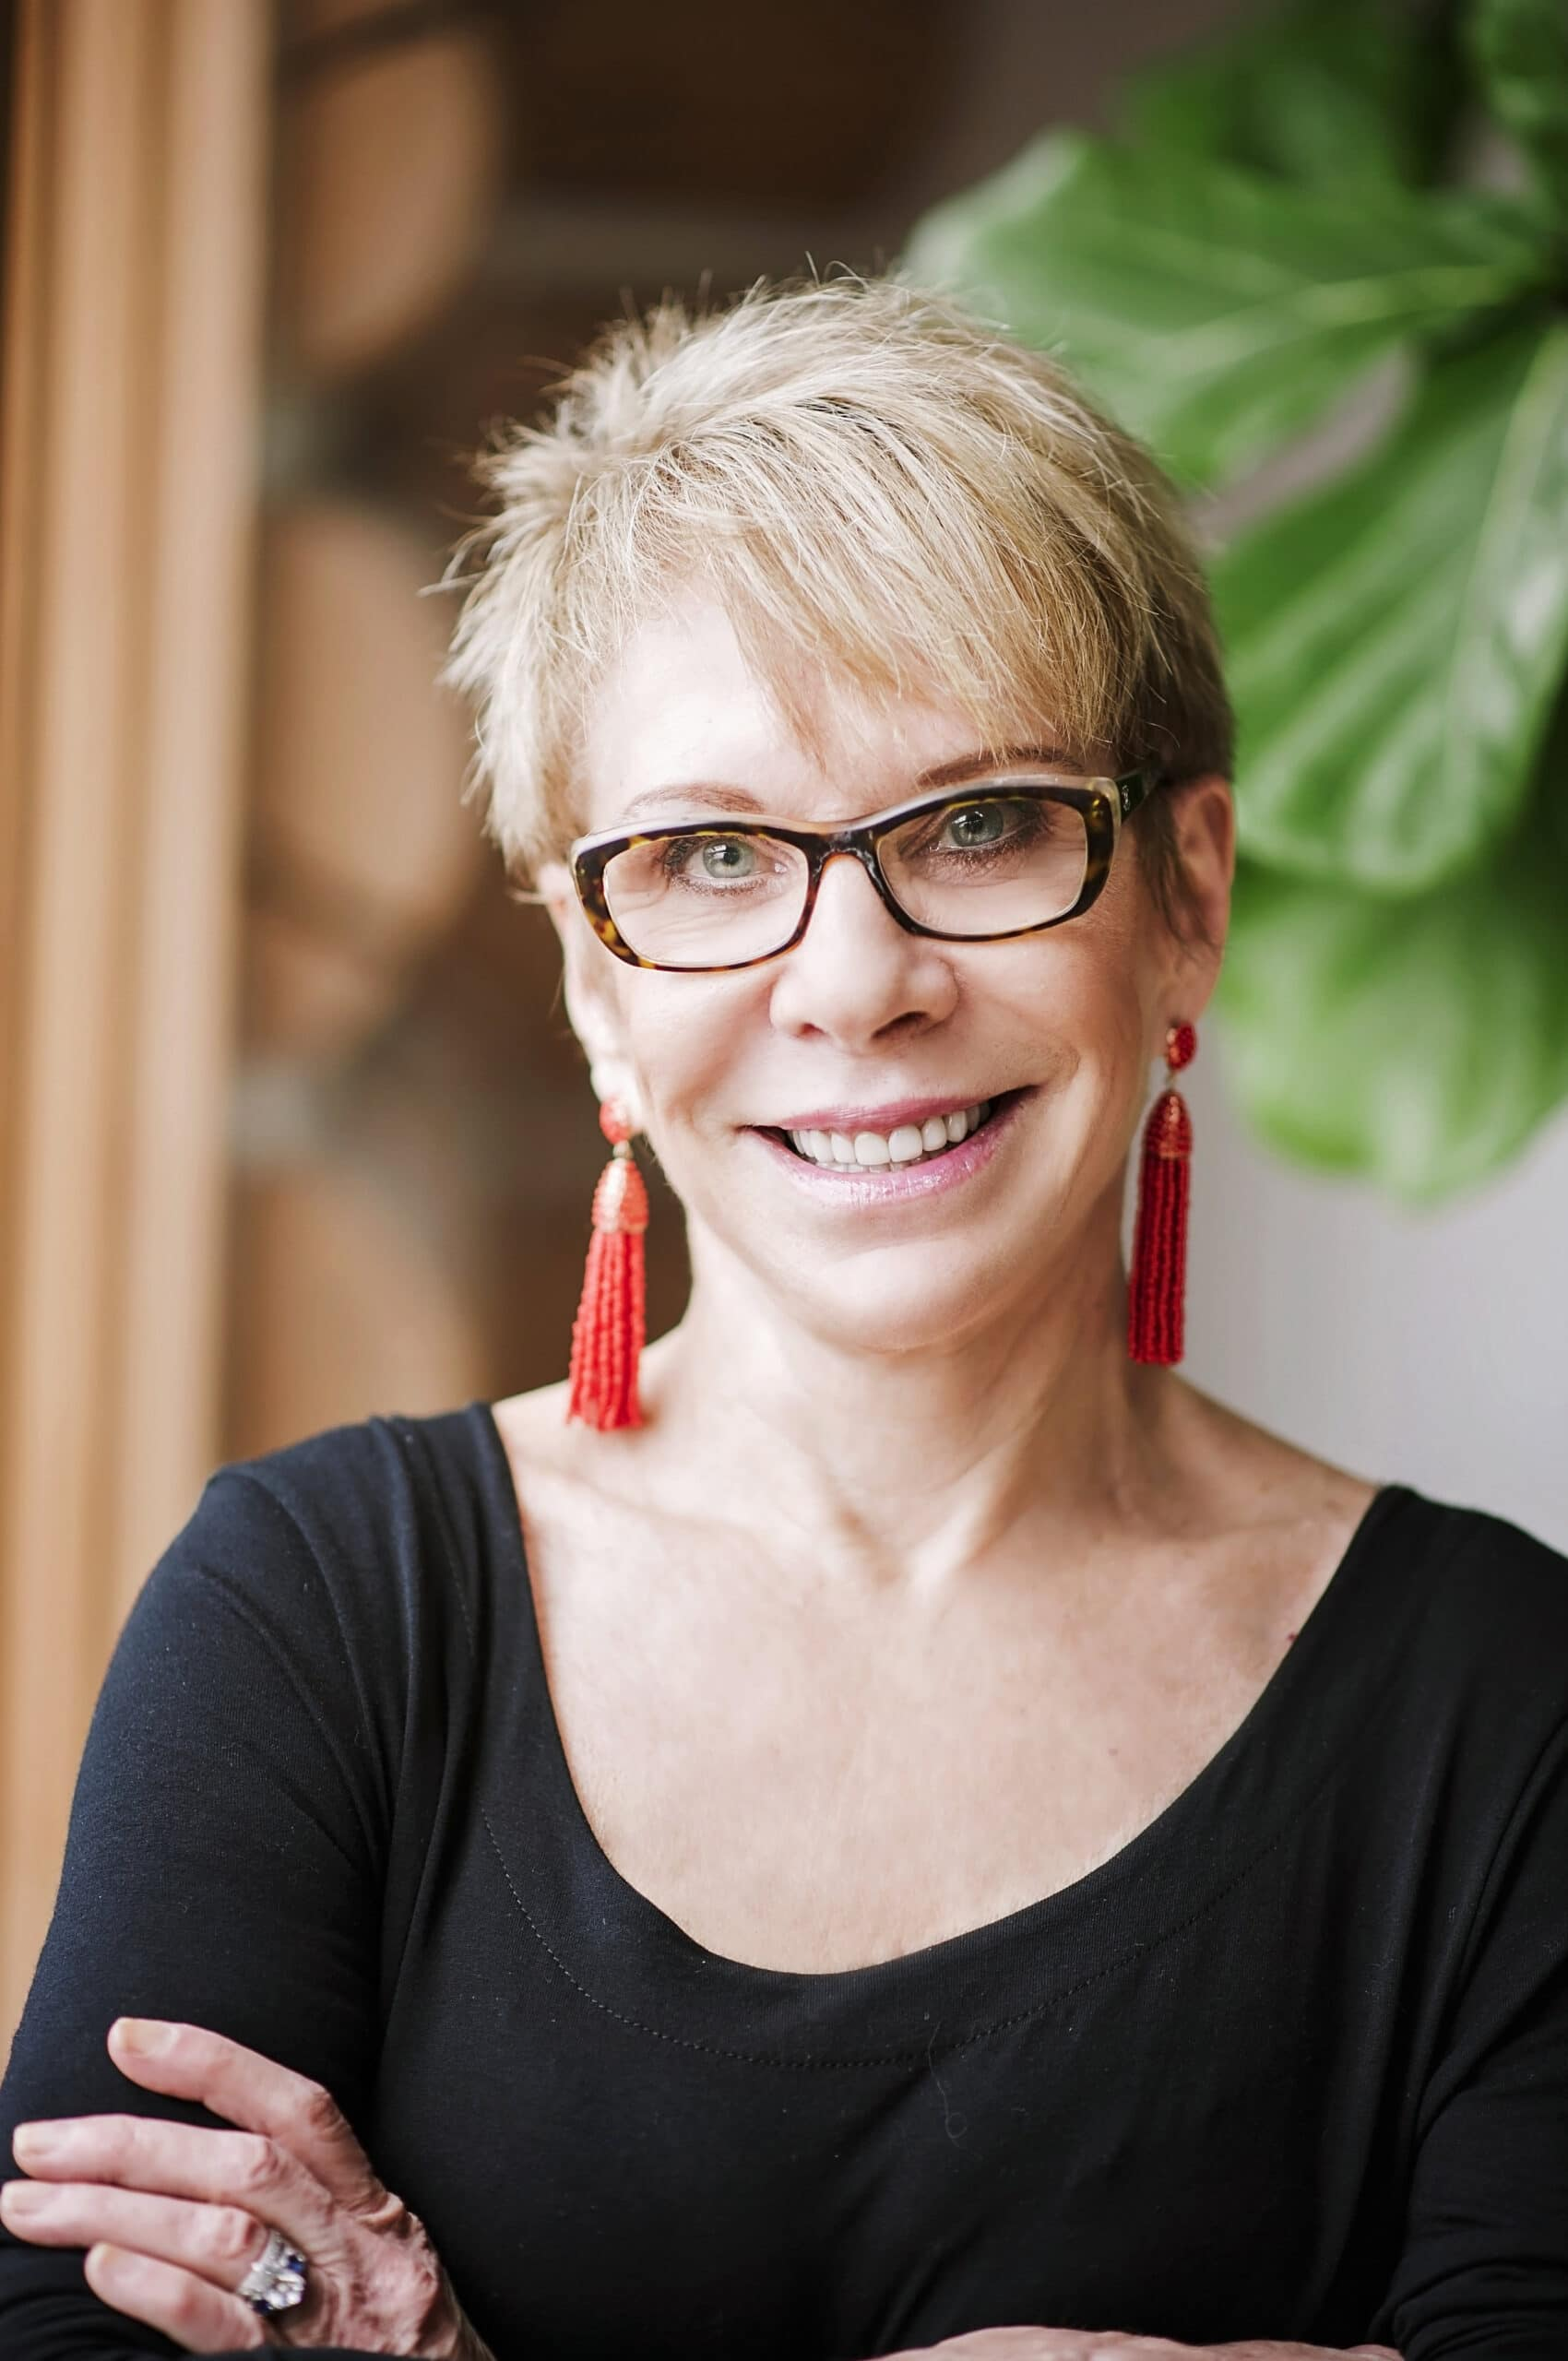 Mandy Ellis